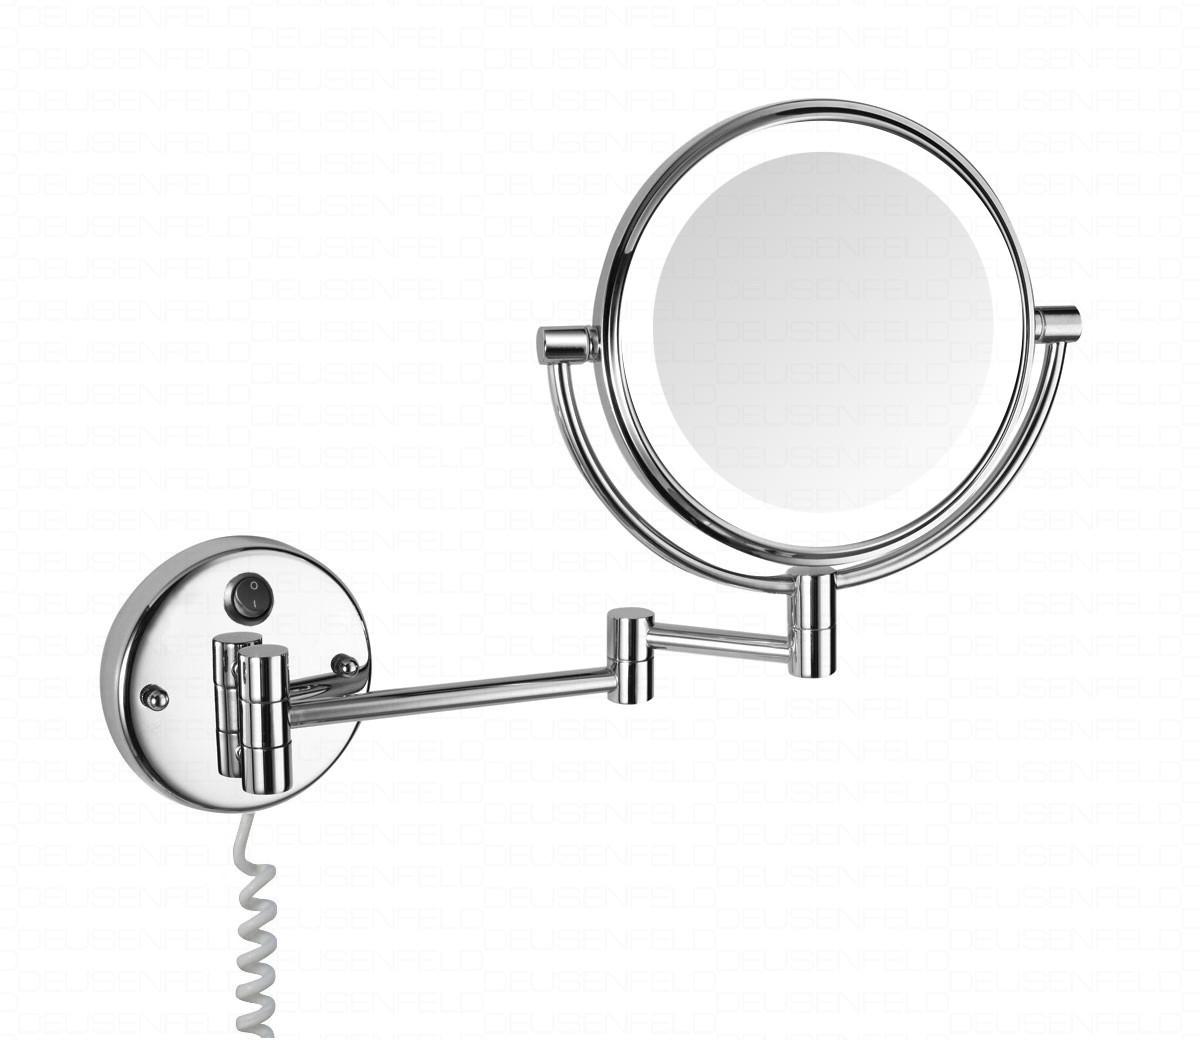 deusenfeld wled52d led doppel wand kosmetikspiegel 5 fach normal 20cm direktanschluss. Black Bedroom Furniture Sets. Home Design Ideas